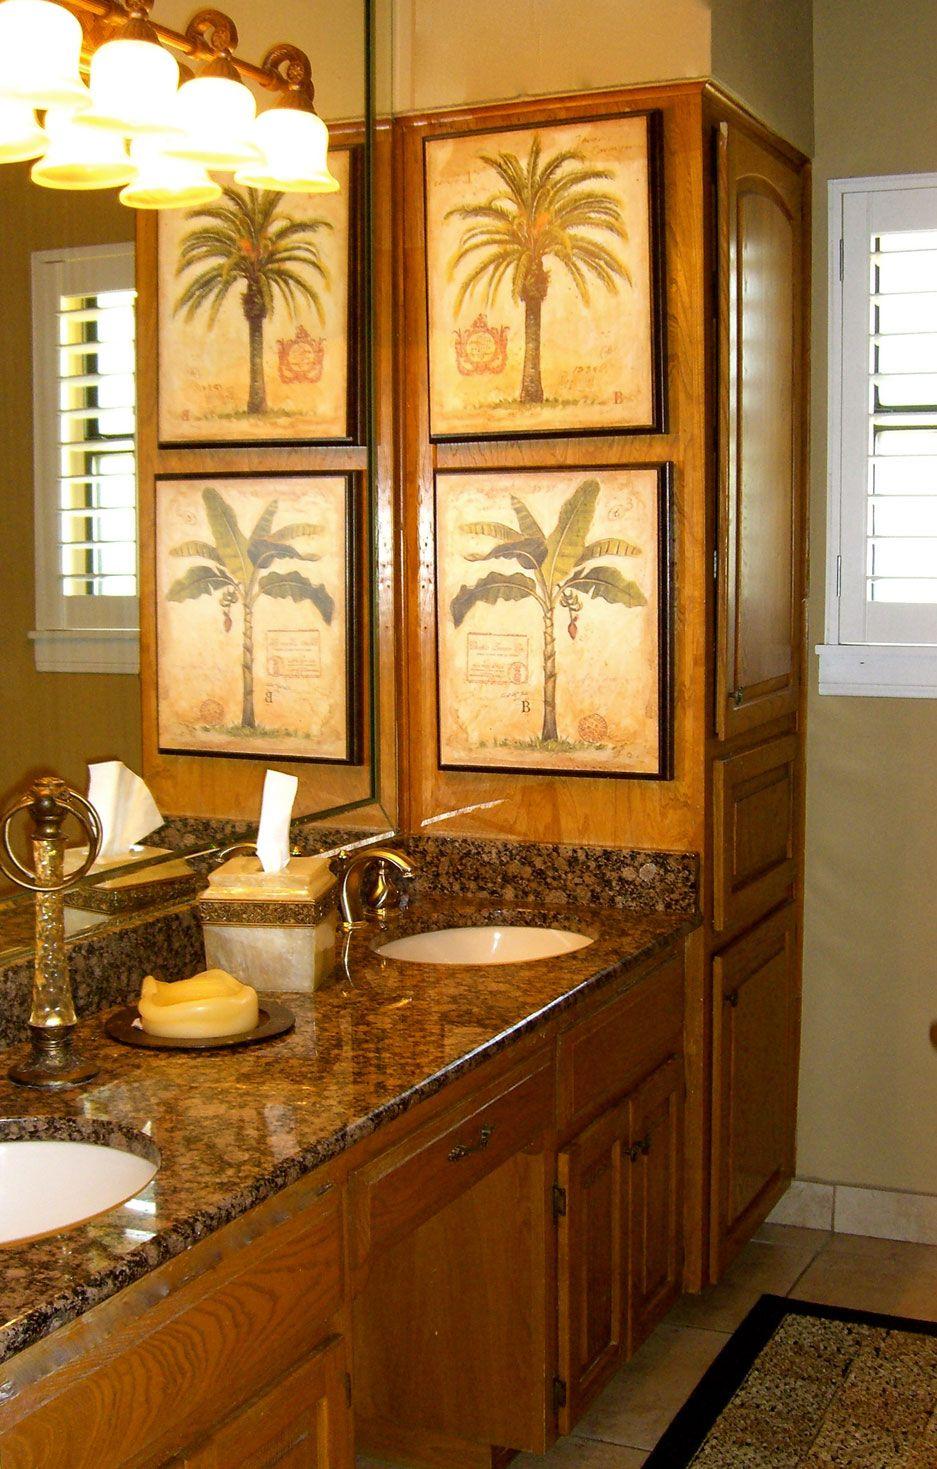 Bathrooms 02 Jpg 937 1 469 Pixels Palm Tree Bathroom Yellow